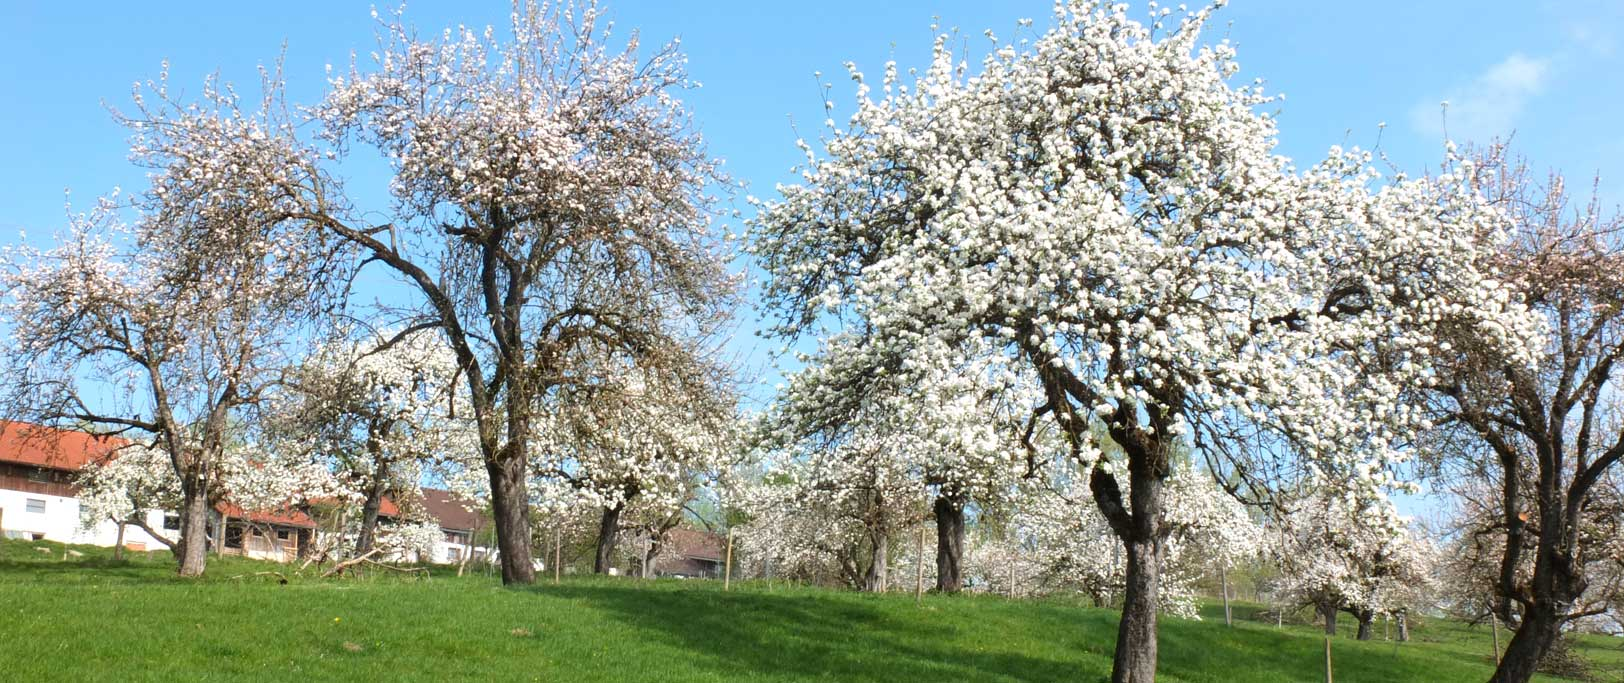 Apfelgarten in Mooseurach am Boschhof